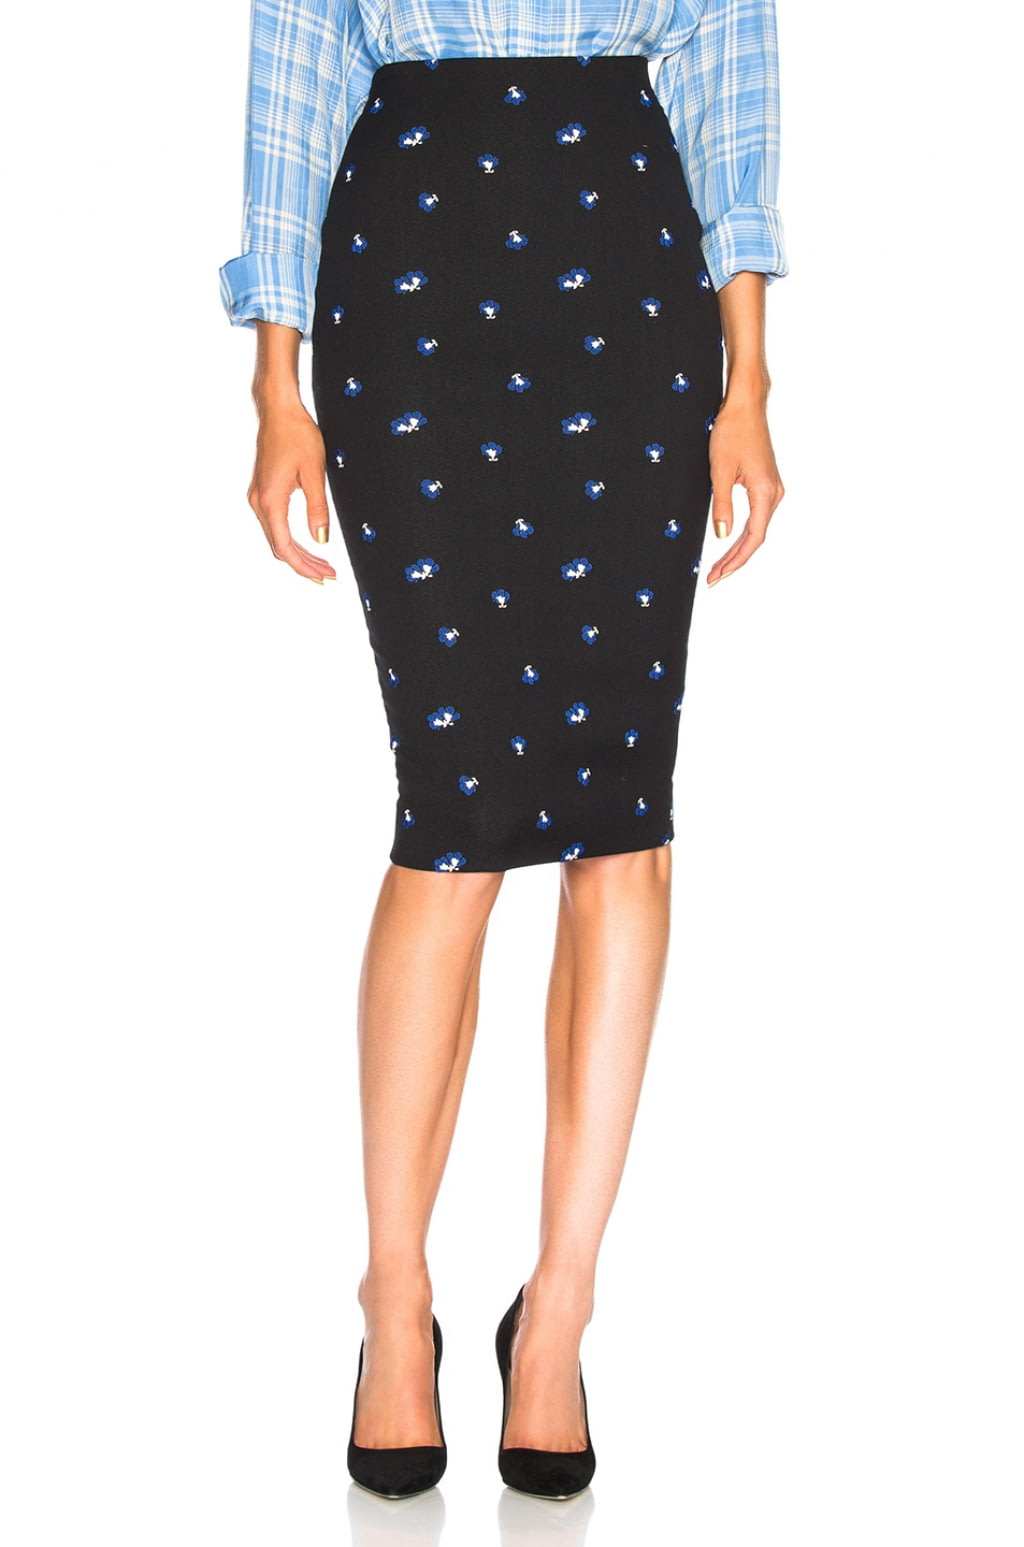 Jual Victoria Beckham Mini Floral Pencil Skirt 100 Original Azure Fashion Star Pants Legging Celana Panjang